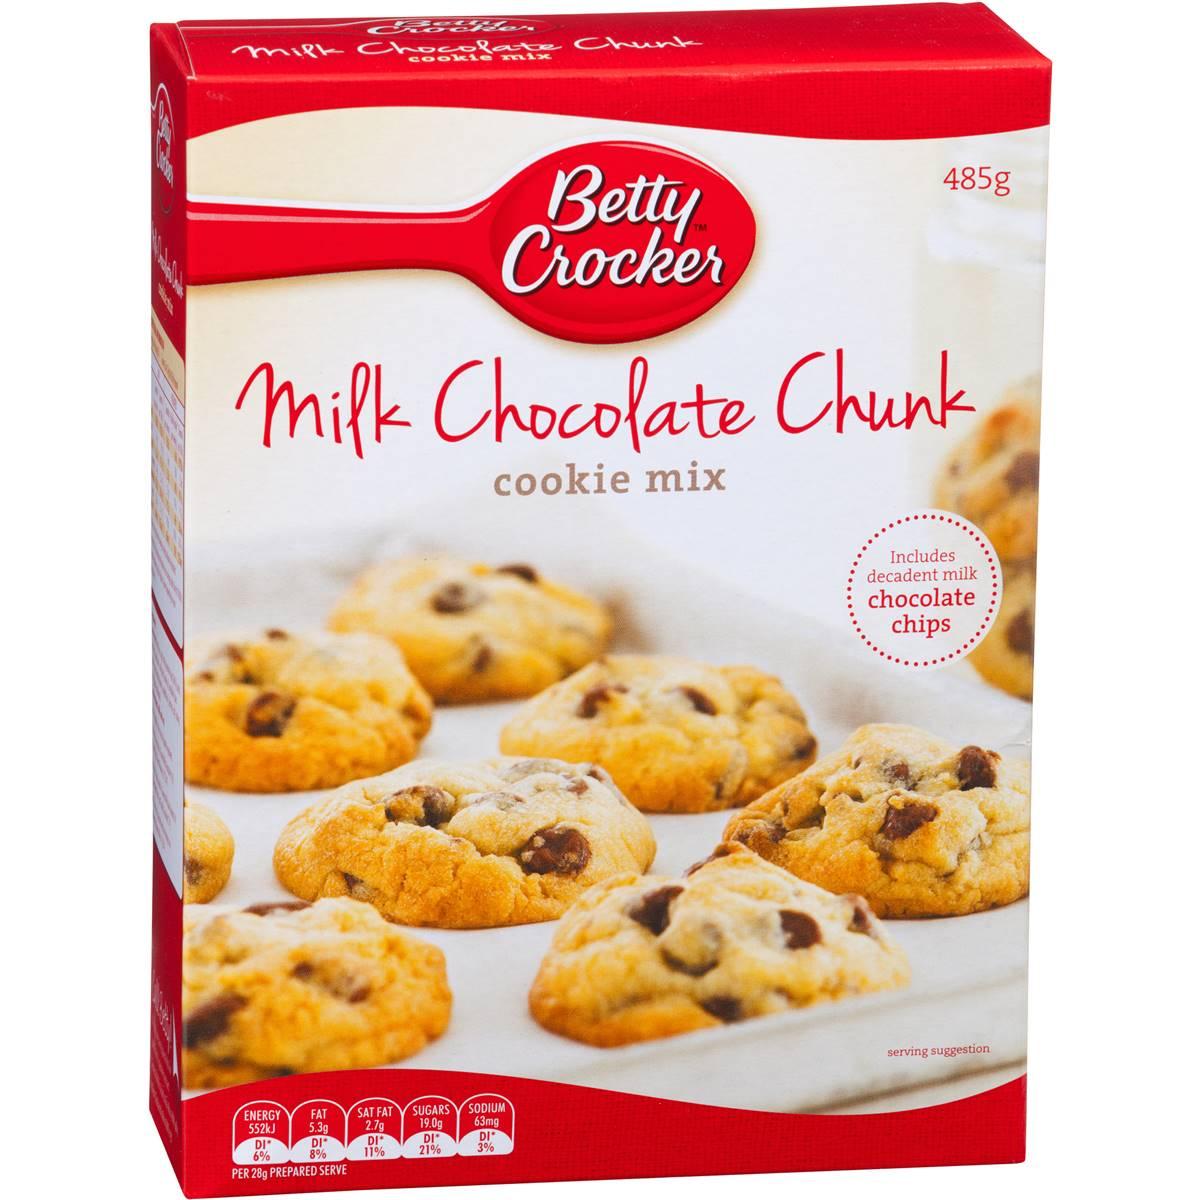 Betty Crocker Milk Chocolate Chunk Cookie Mix 485g